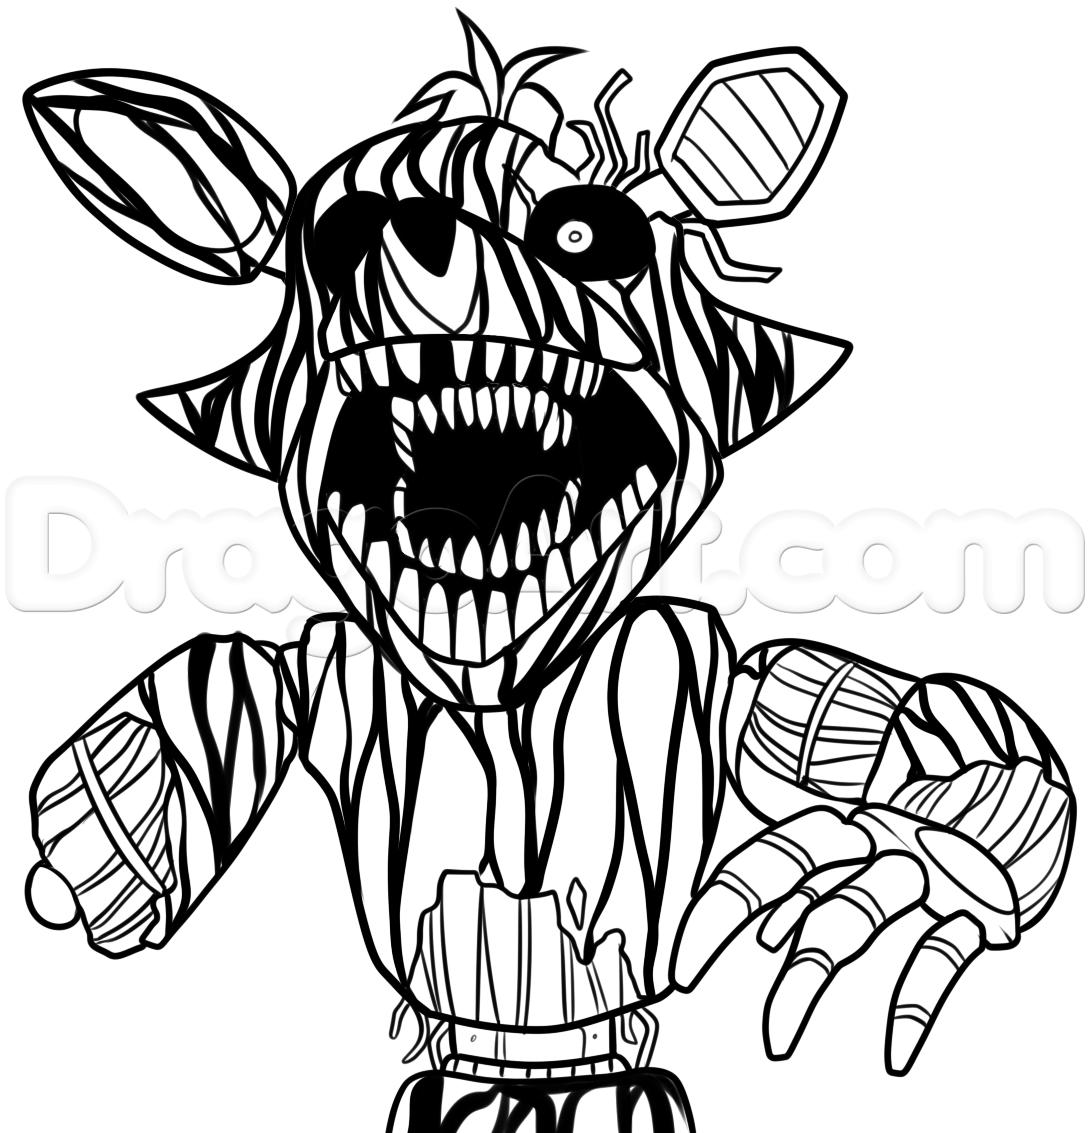 1090x1133 How To Draw Phantom Foxy From Five Nights